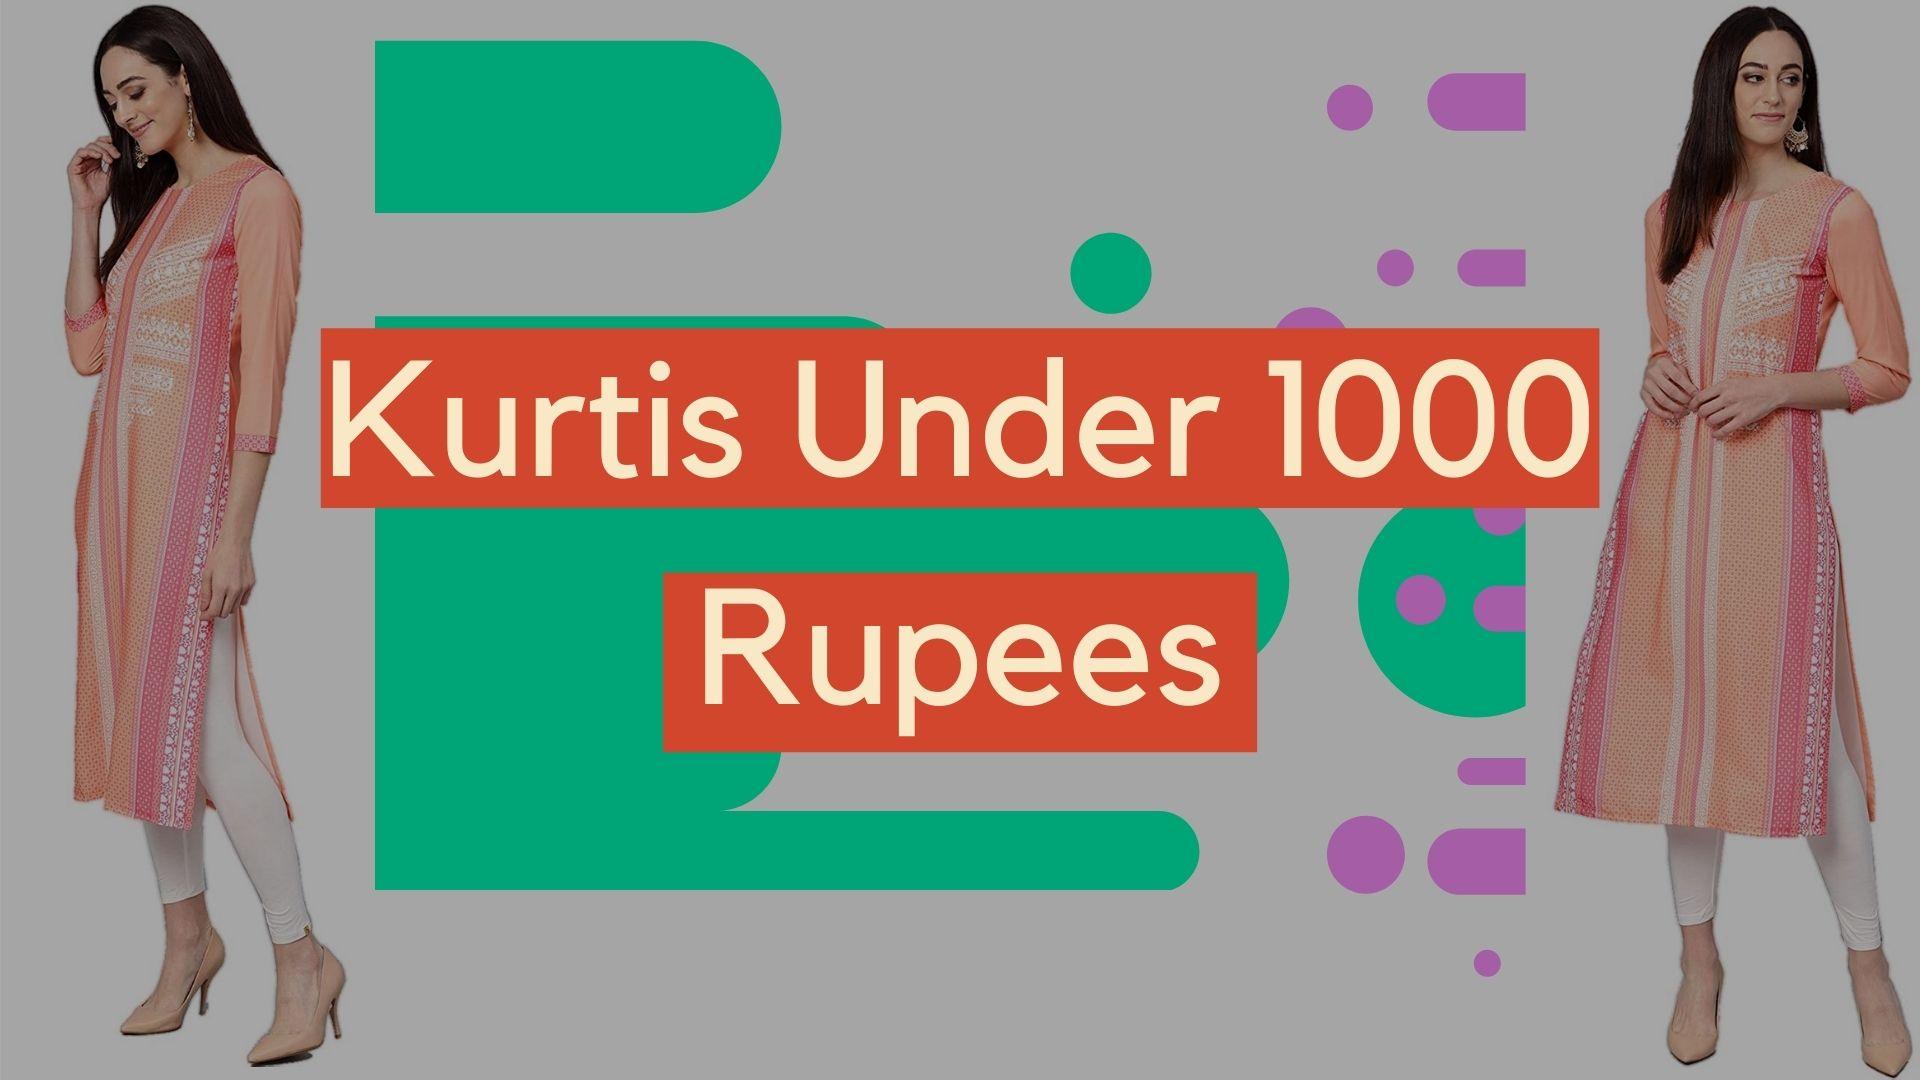 Kurtis Under 1000 Rupees